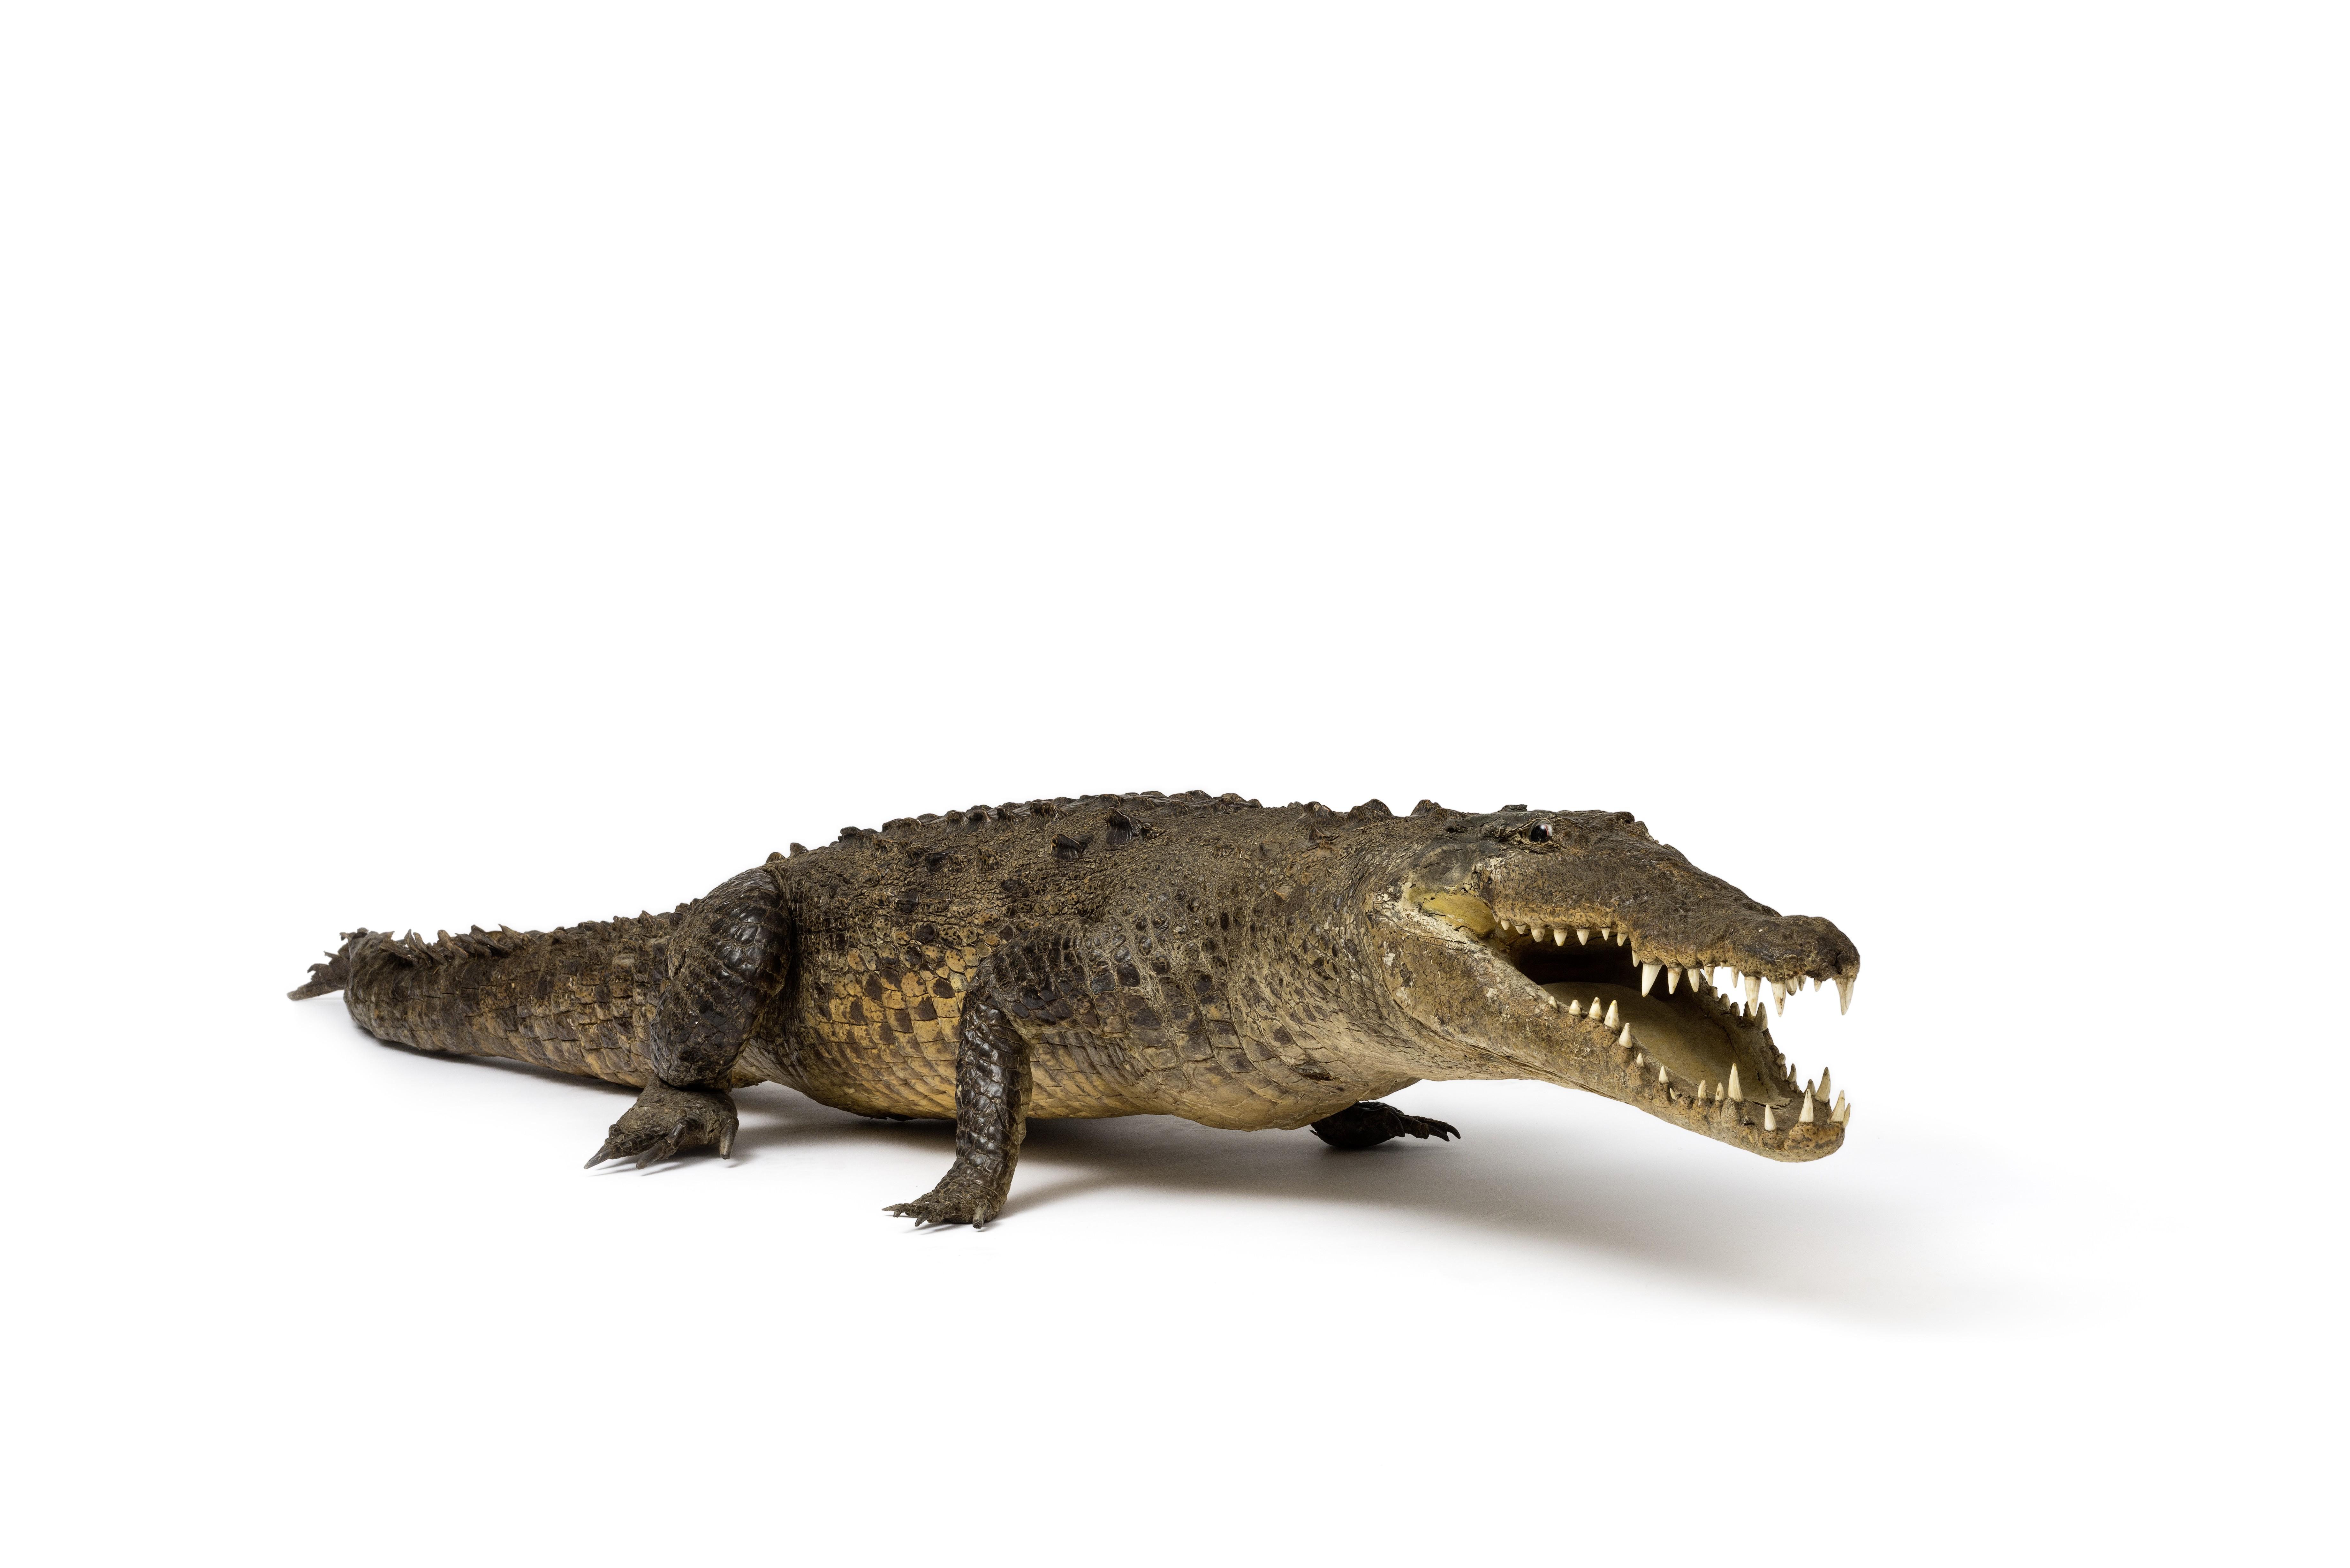 Preparation of a Cuban Crocodile, around 1970 (Potsdam Natural History Museum, photo: Ronka Oberhammer / Lorenz Kienzle, CC BY-NC-SA)